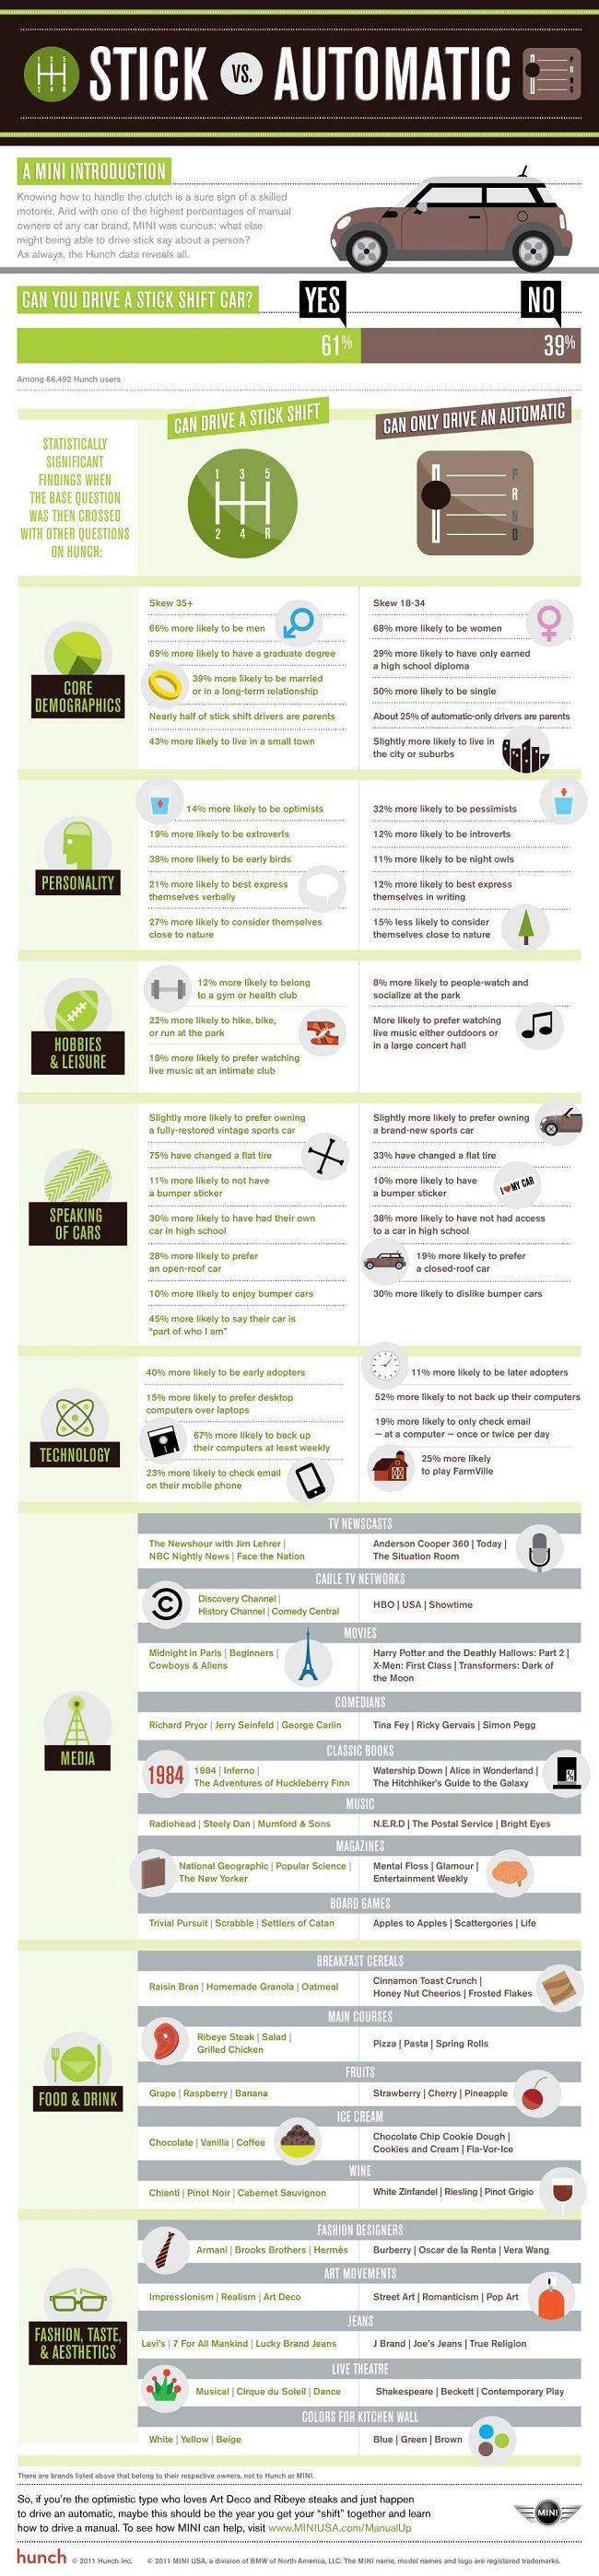 Stick Shift Vs Automatic Transmission Infographic | Automotive Blog